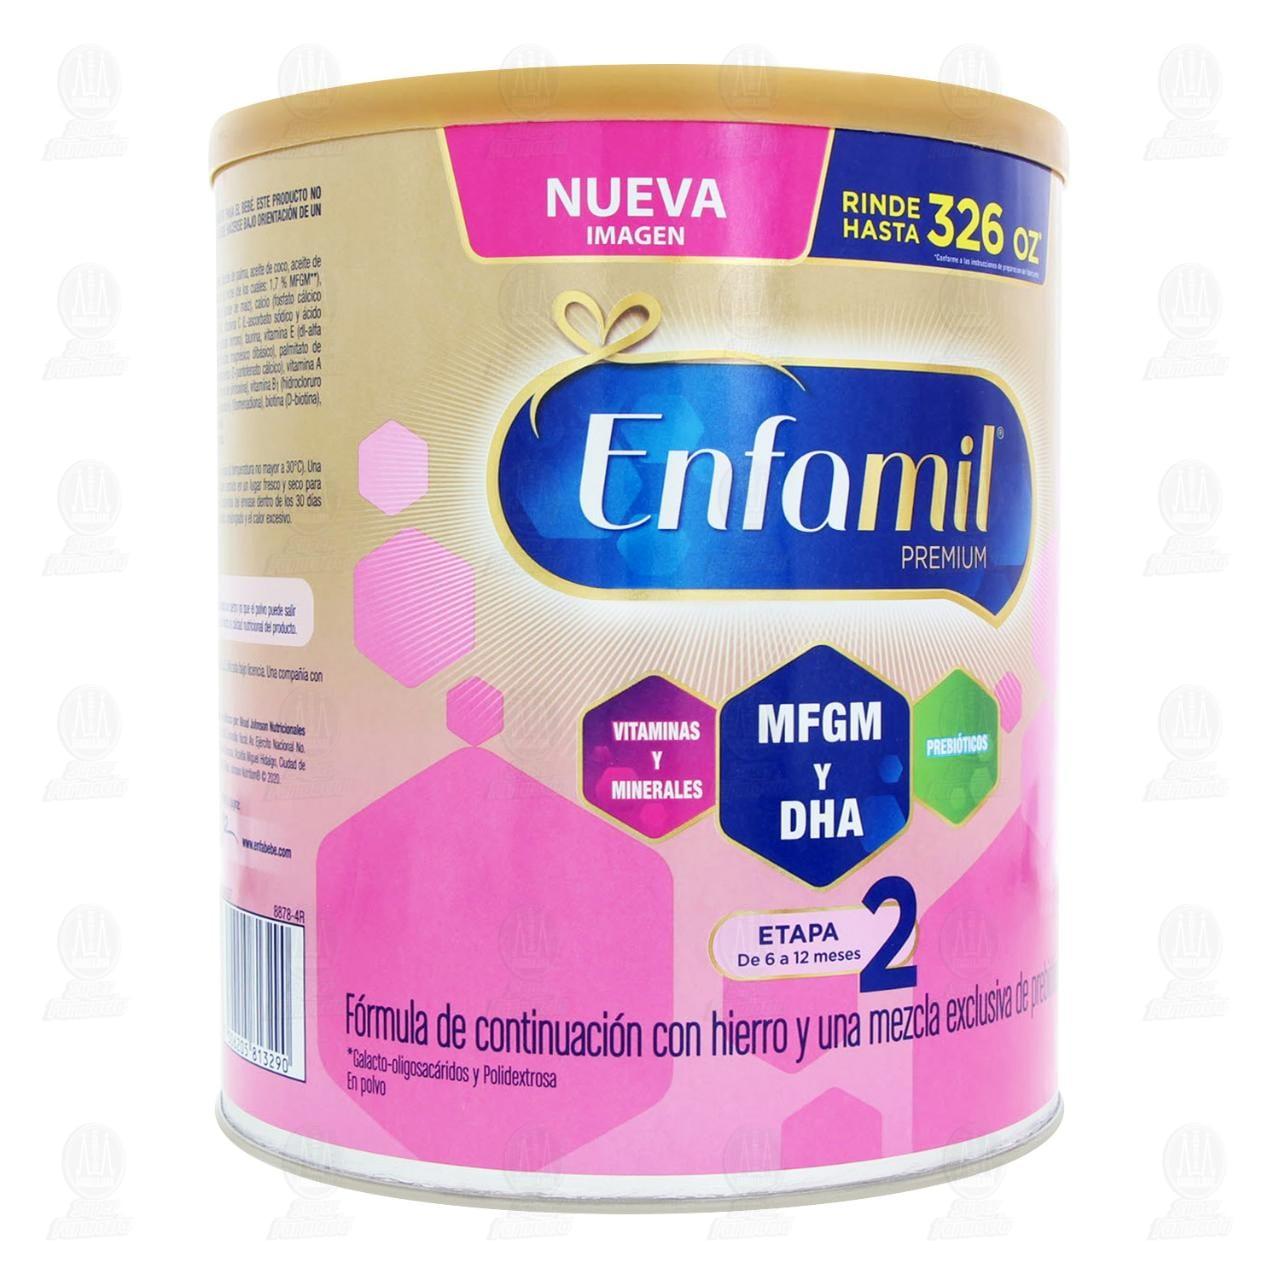 Comprar Fórmula Infantil Enfamil Premium Promental Etapa 2 en Polvo (Edad 6-12 Meses), 1.5 kg. en Farmacias Guadalajara